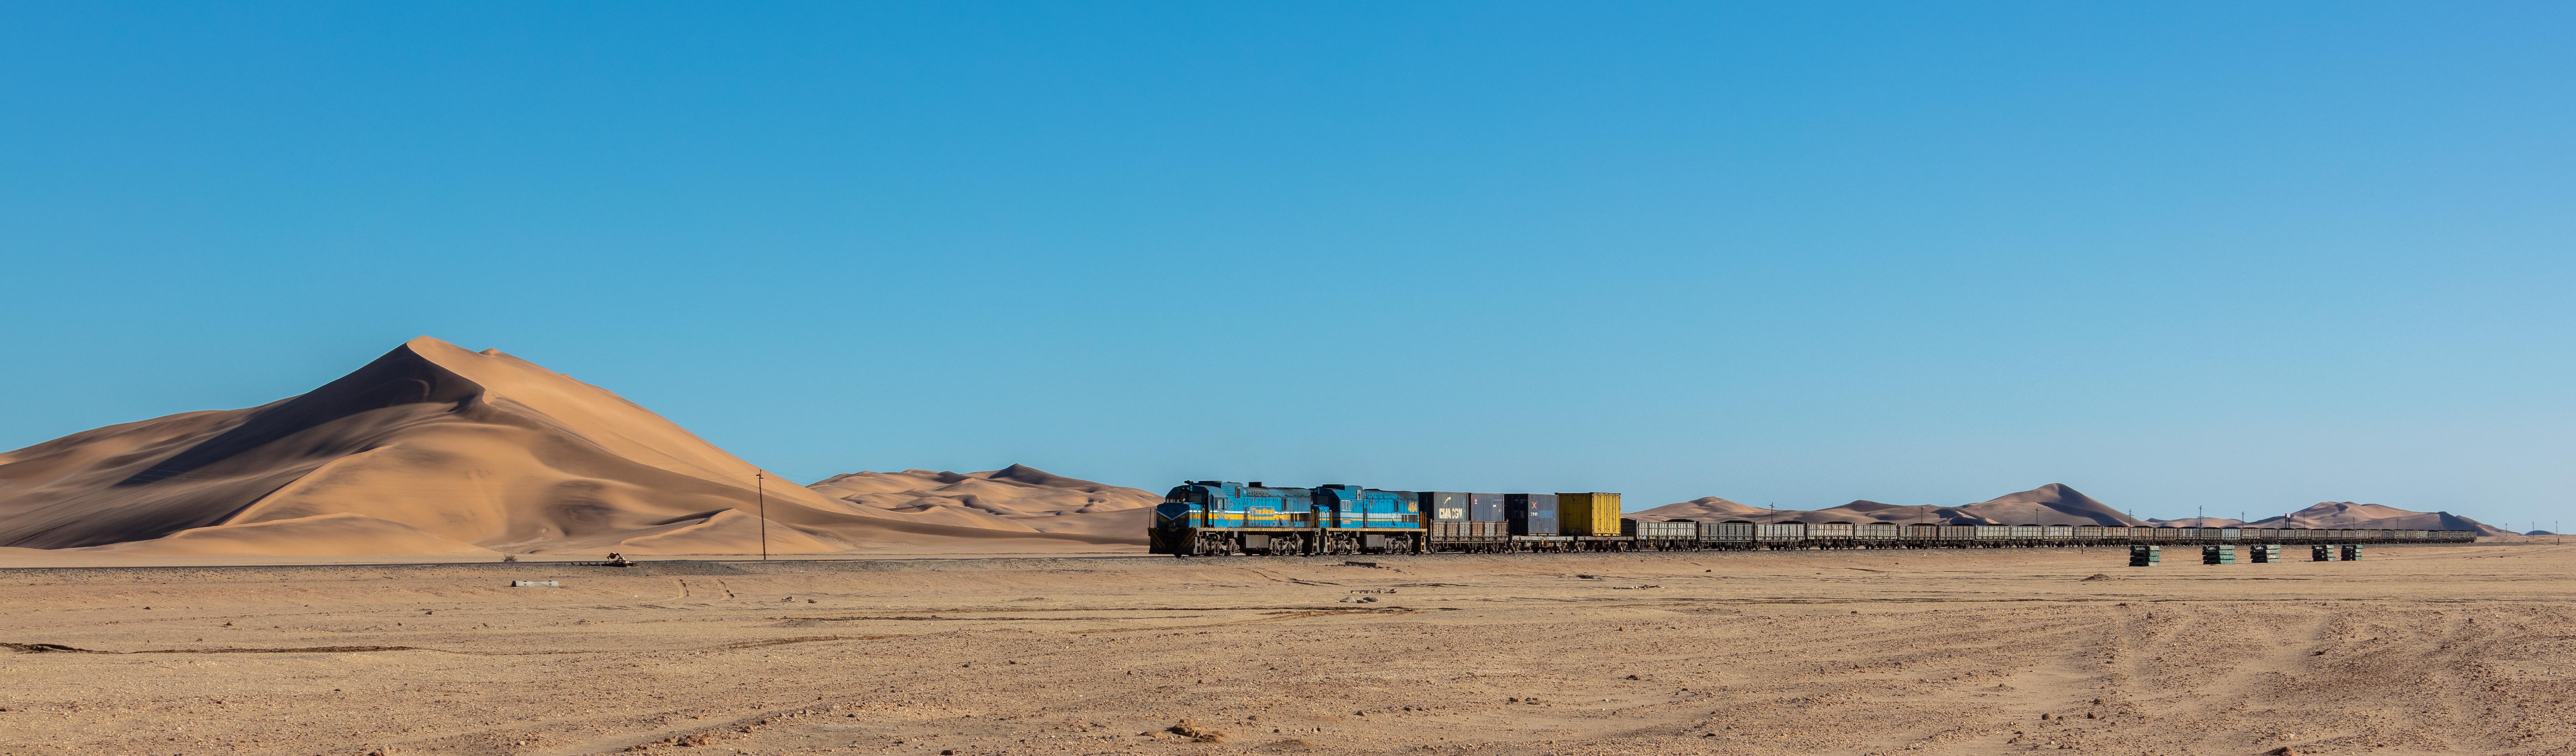 dating namibia walvis bay match gør kundli i gujarati